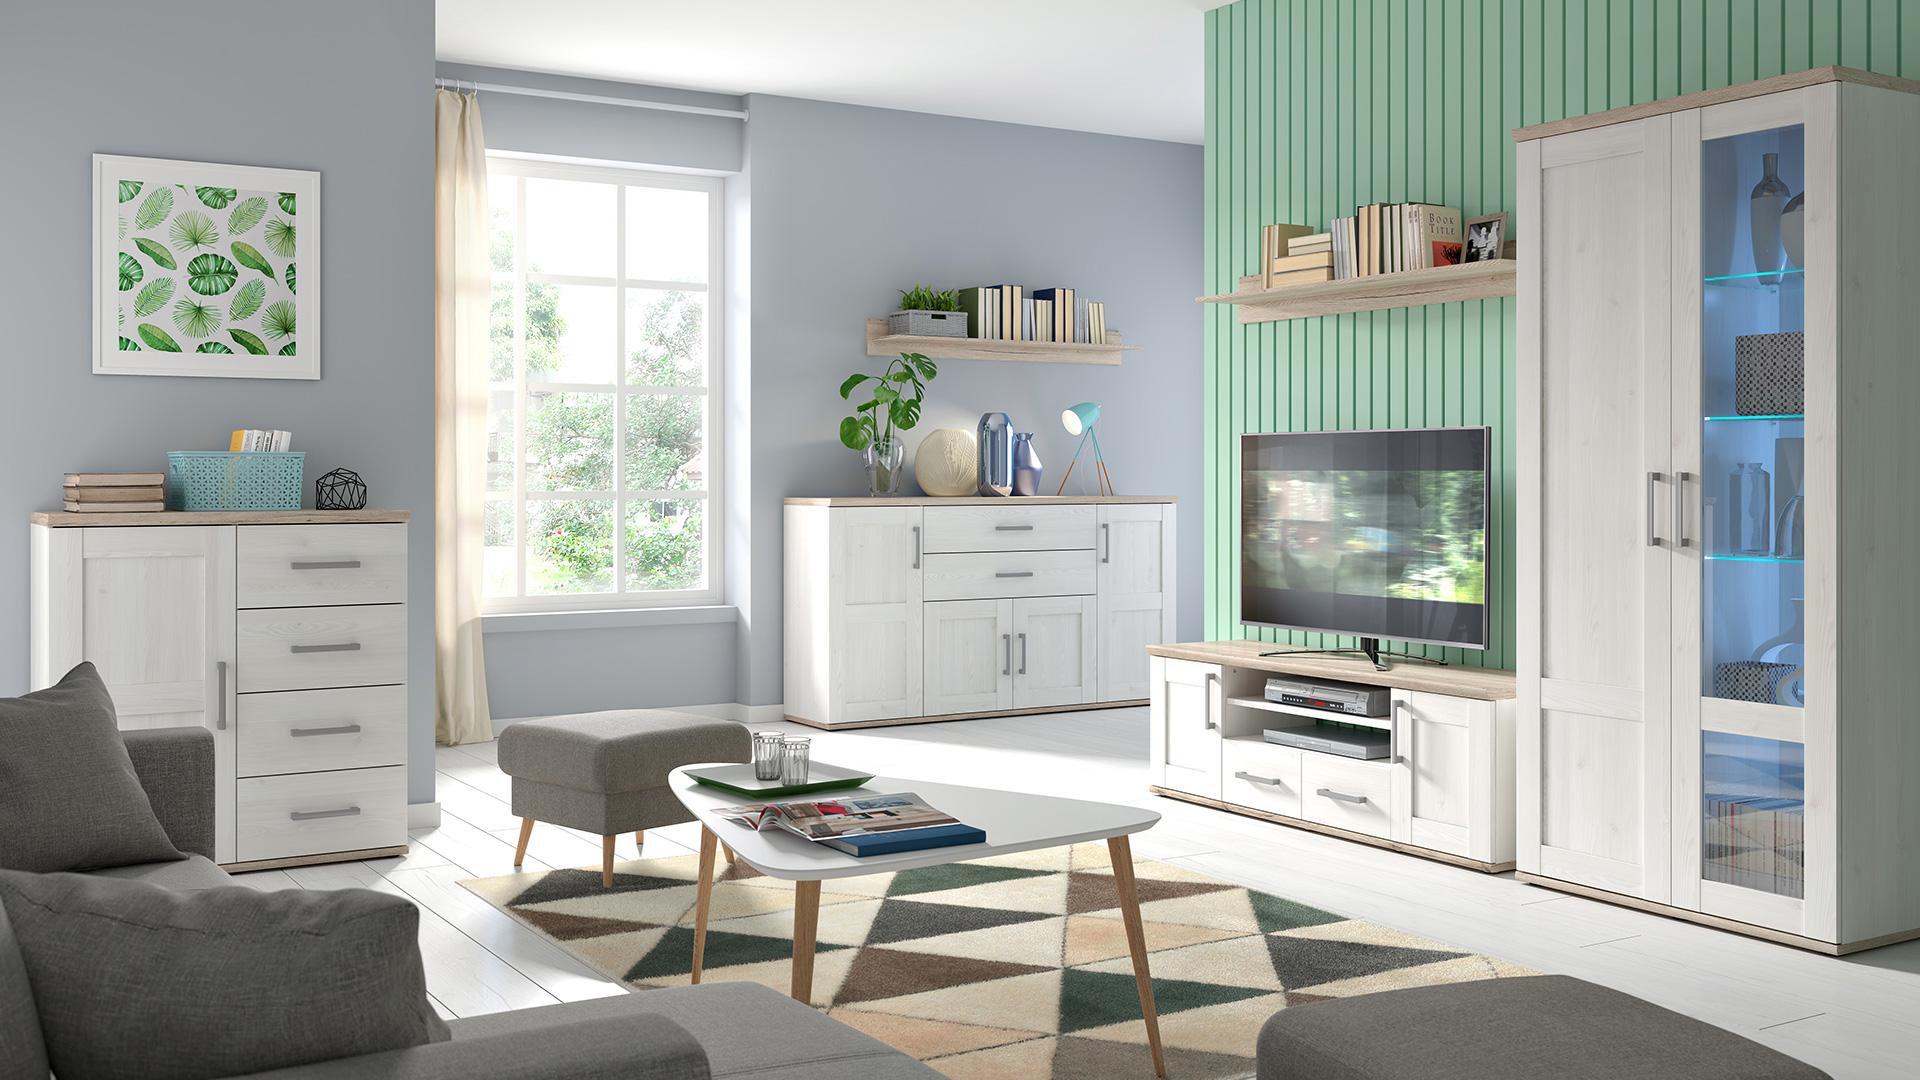 Meble Romance Skandynawska Wizytówka Mieszkania Euro Furniture